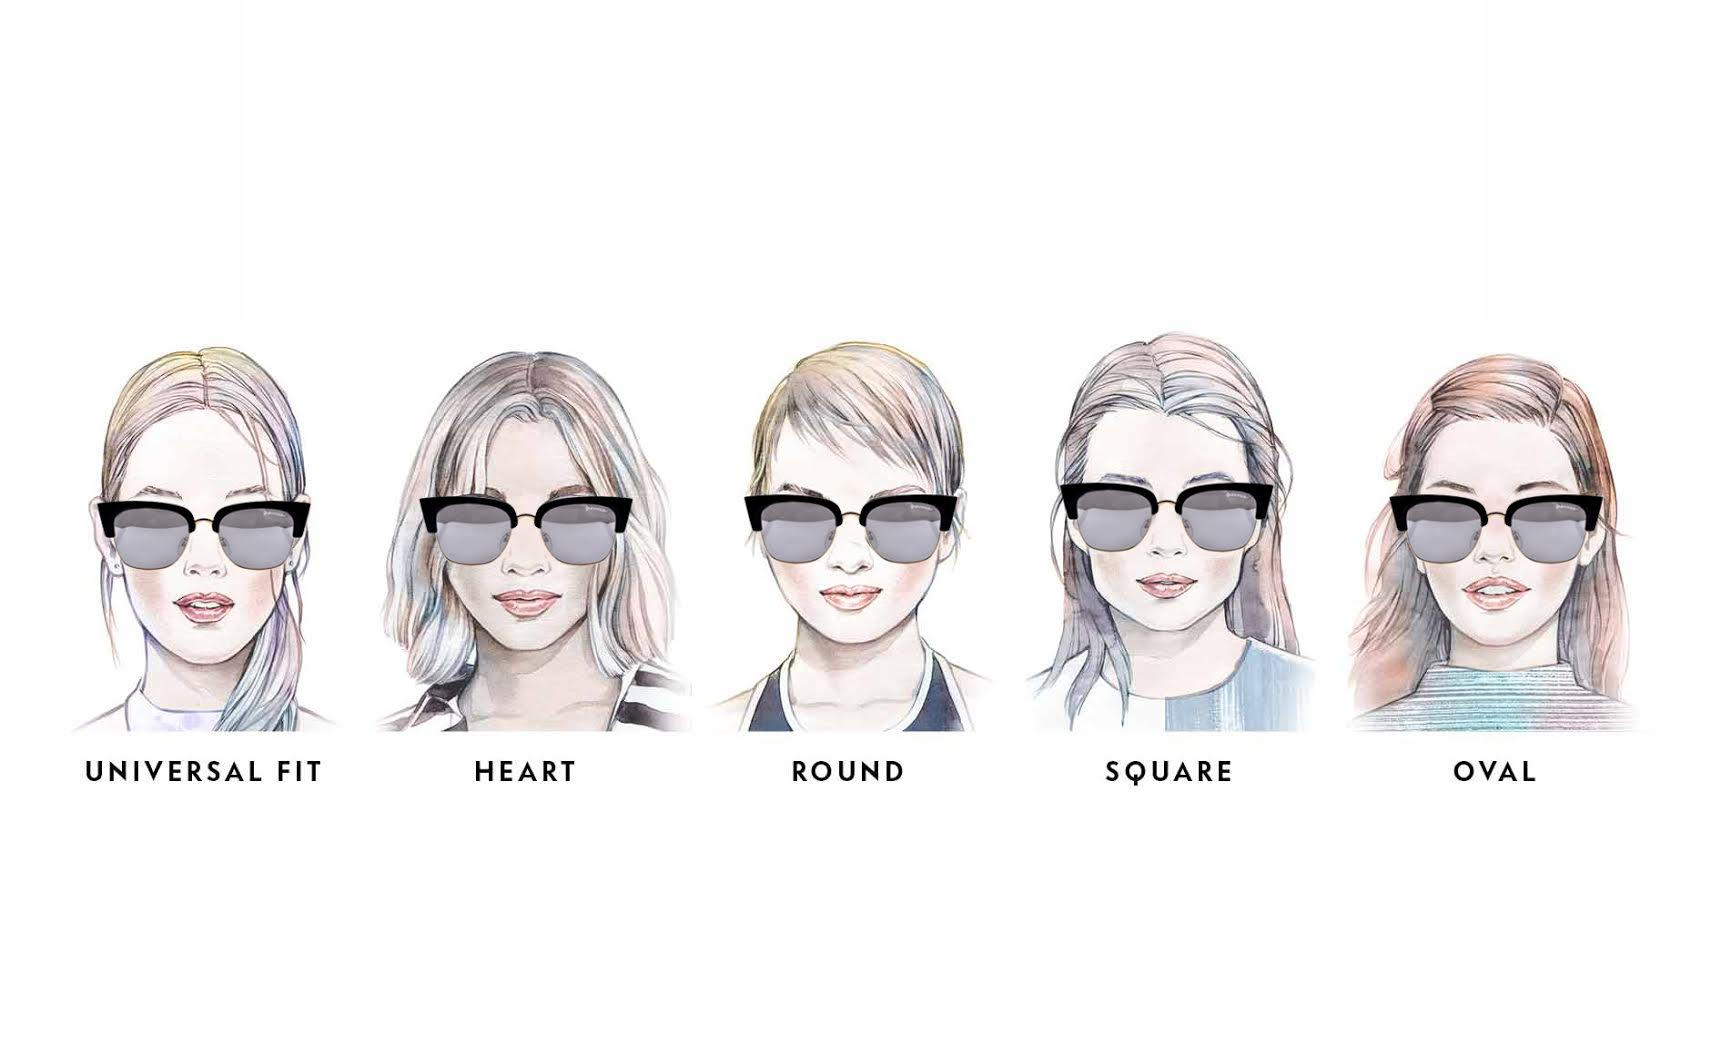 York 在各種臉型 ( 百搭臉, 心型臉, 圓臉, 方形臉, 鵝蛋臉 )